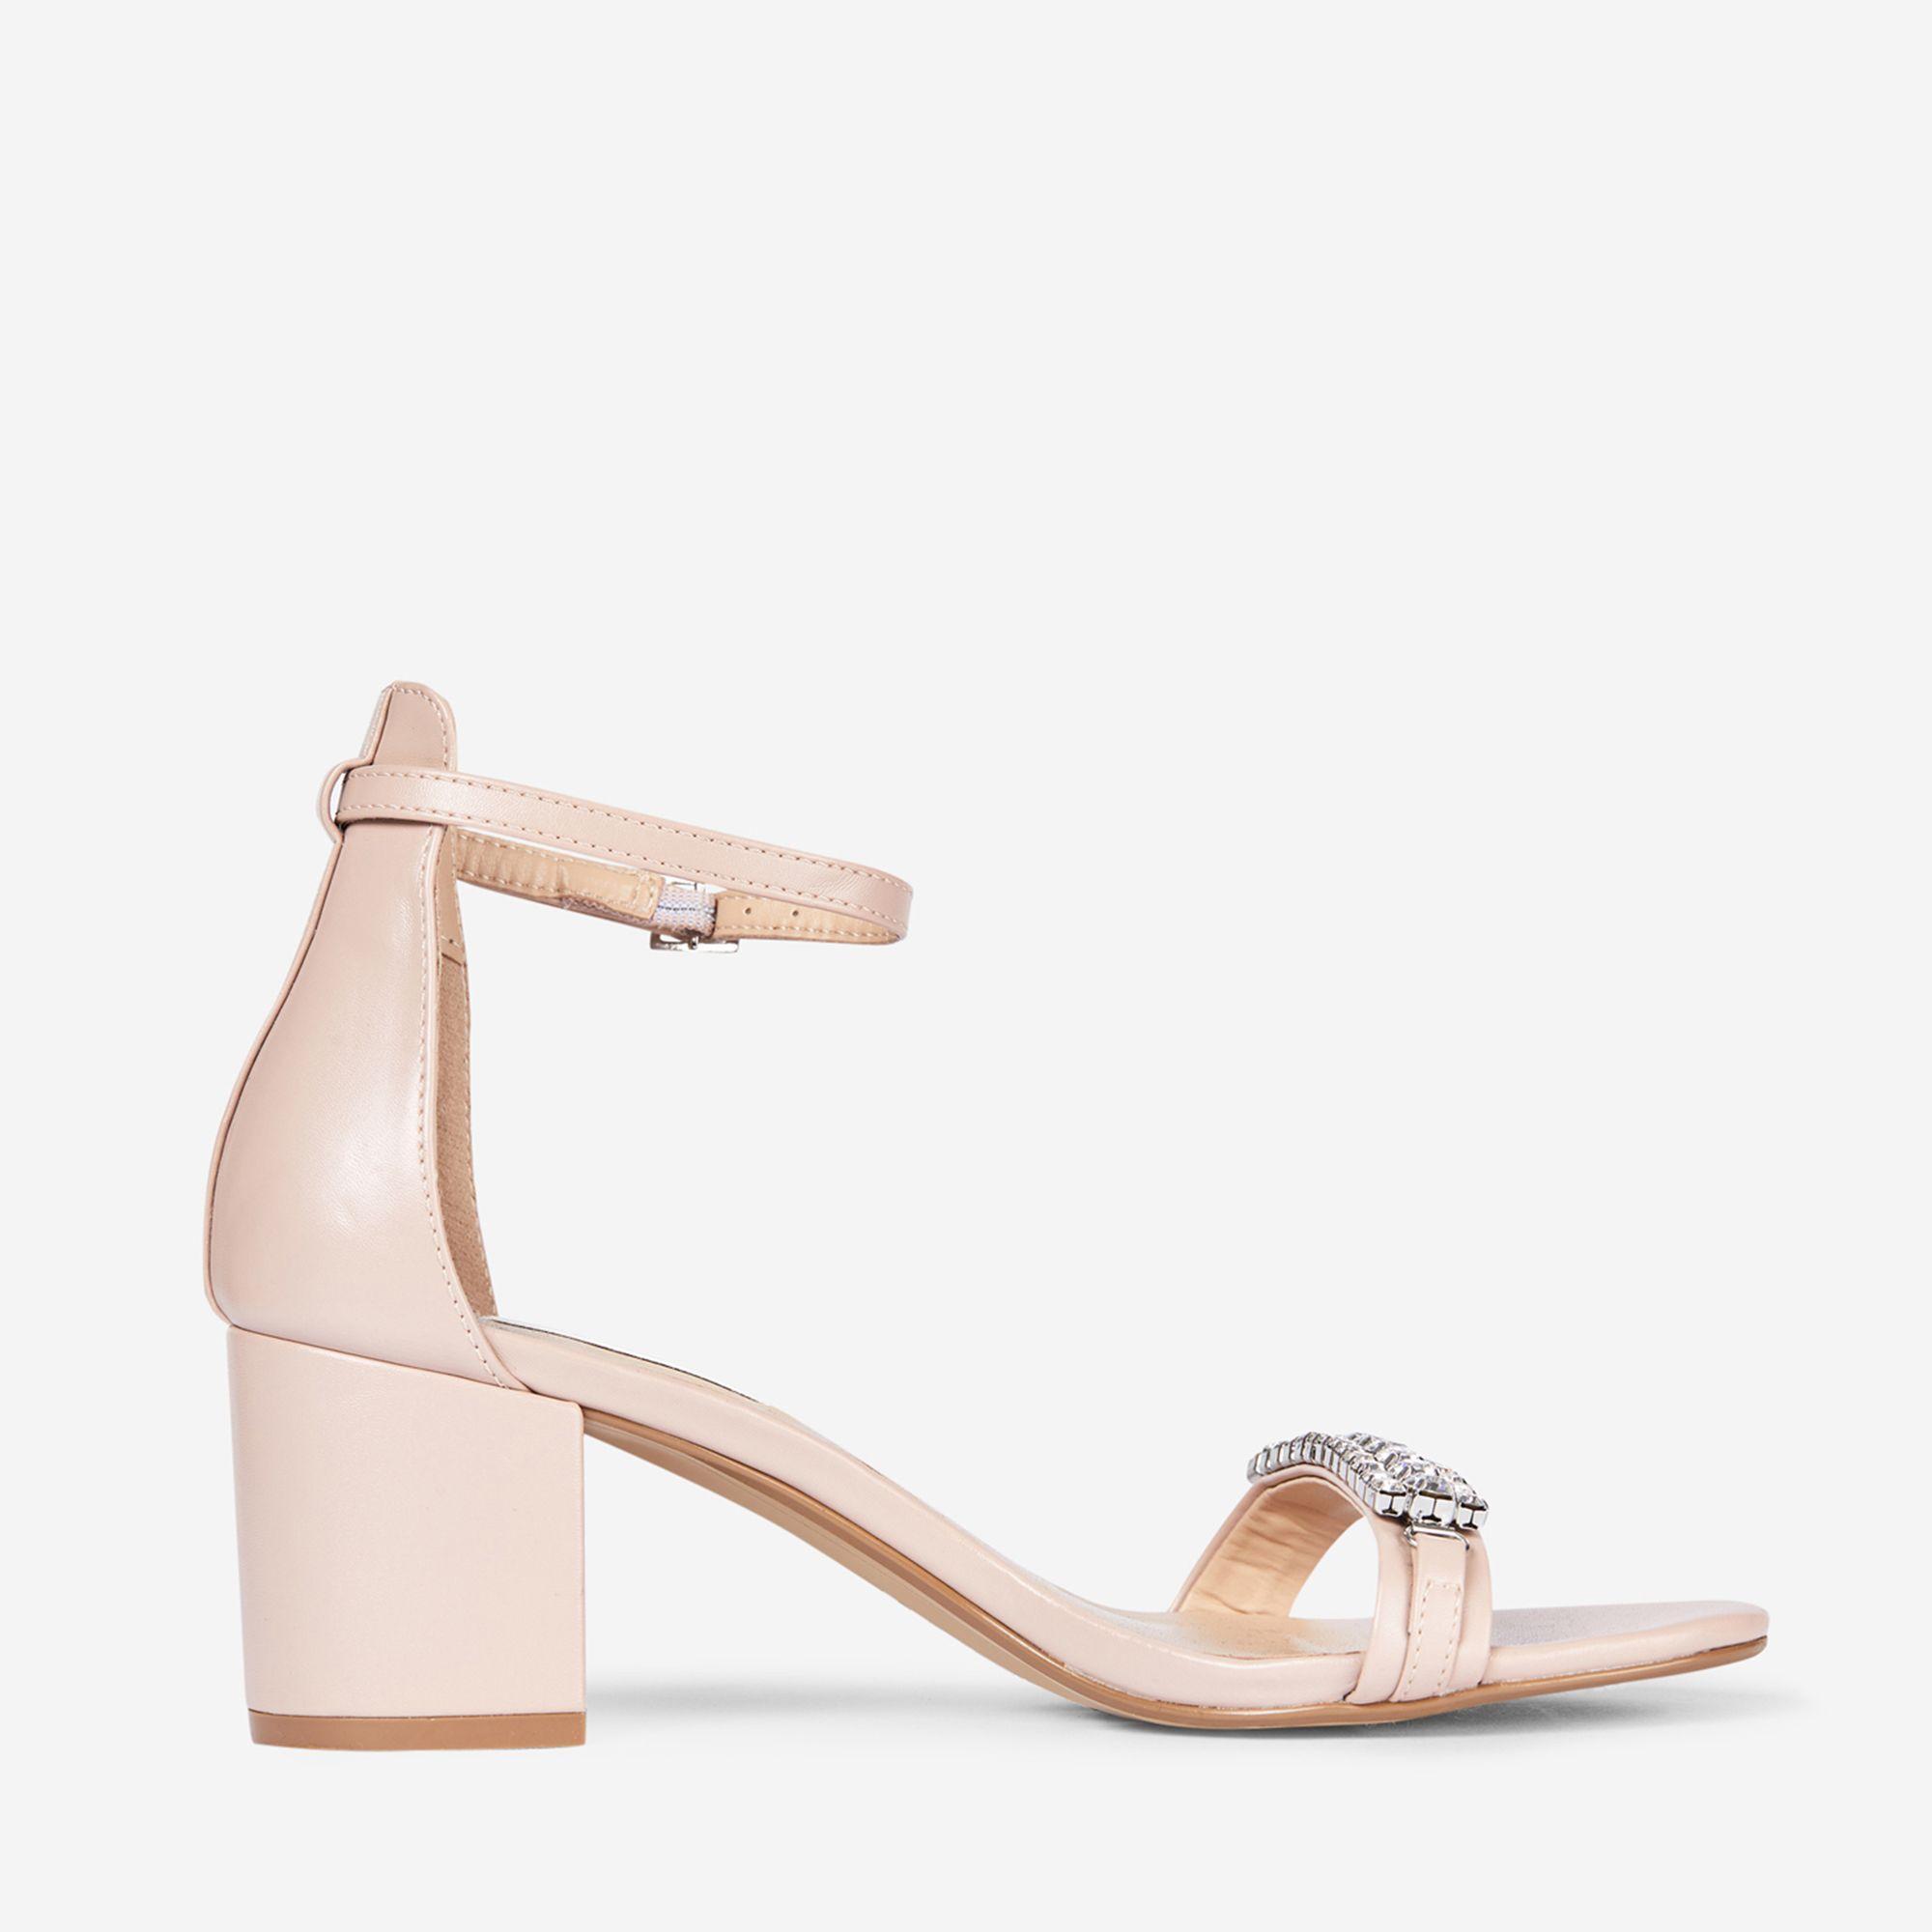 5c258f1af5c Dorothy Perkins Showcase Nude Polyurethane Sapphire Sandals in ...